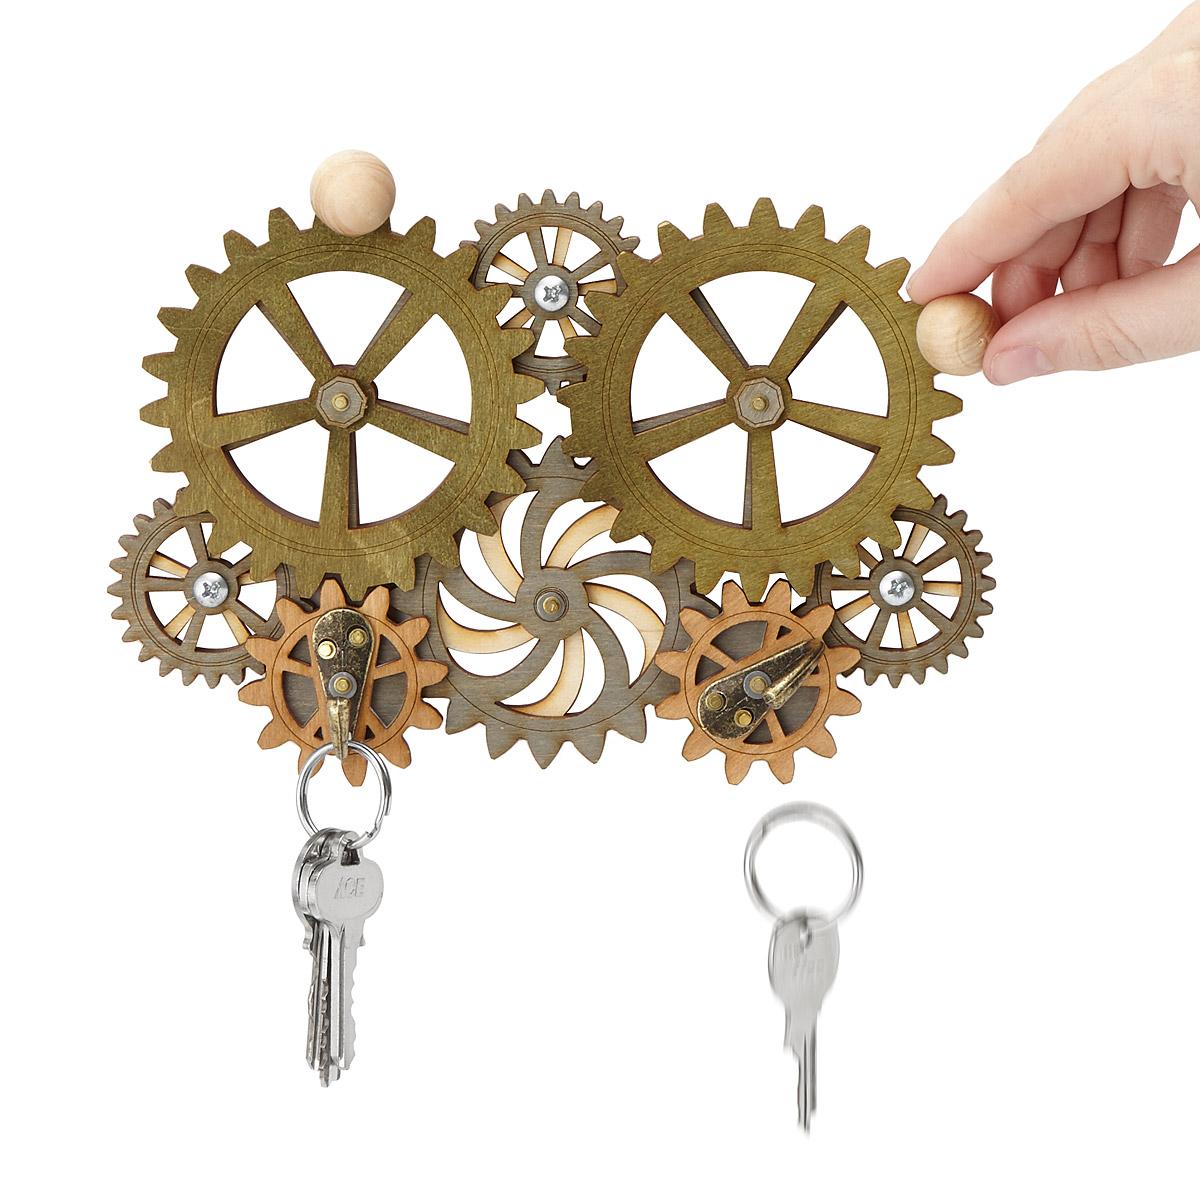 Kinetic Gear Key Holder | UncommonGoods